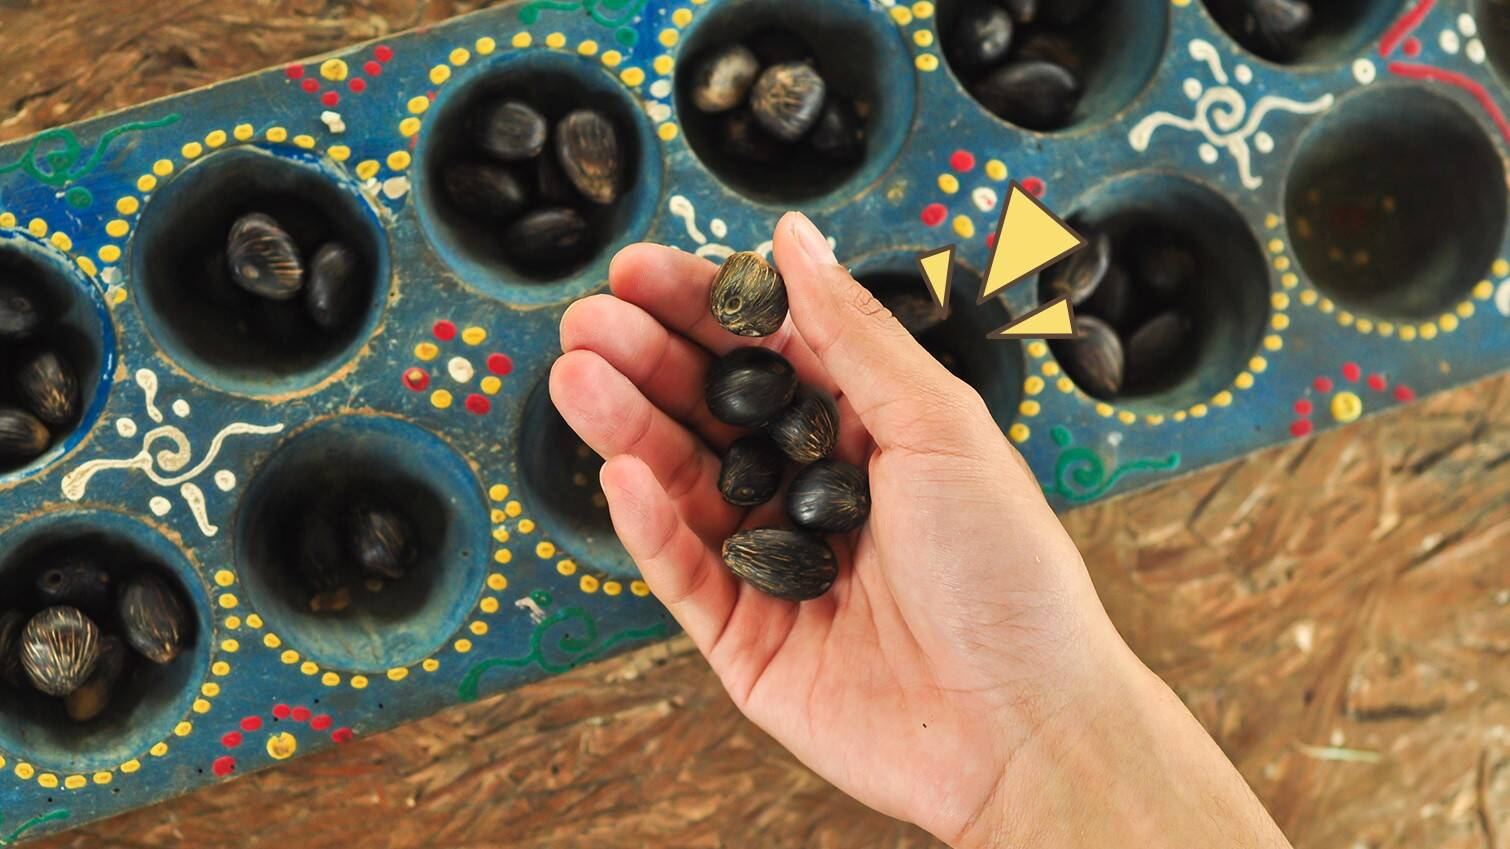 Sebelum Ada Teknologi Ini 6 Permainan Tradisional Dari Jawa Yang Banyak Dimainkan Anak Anak